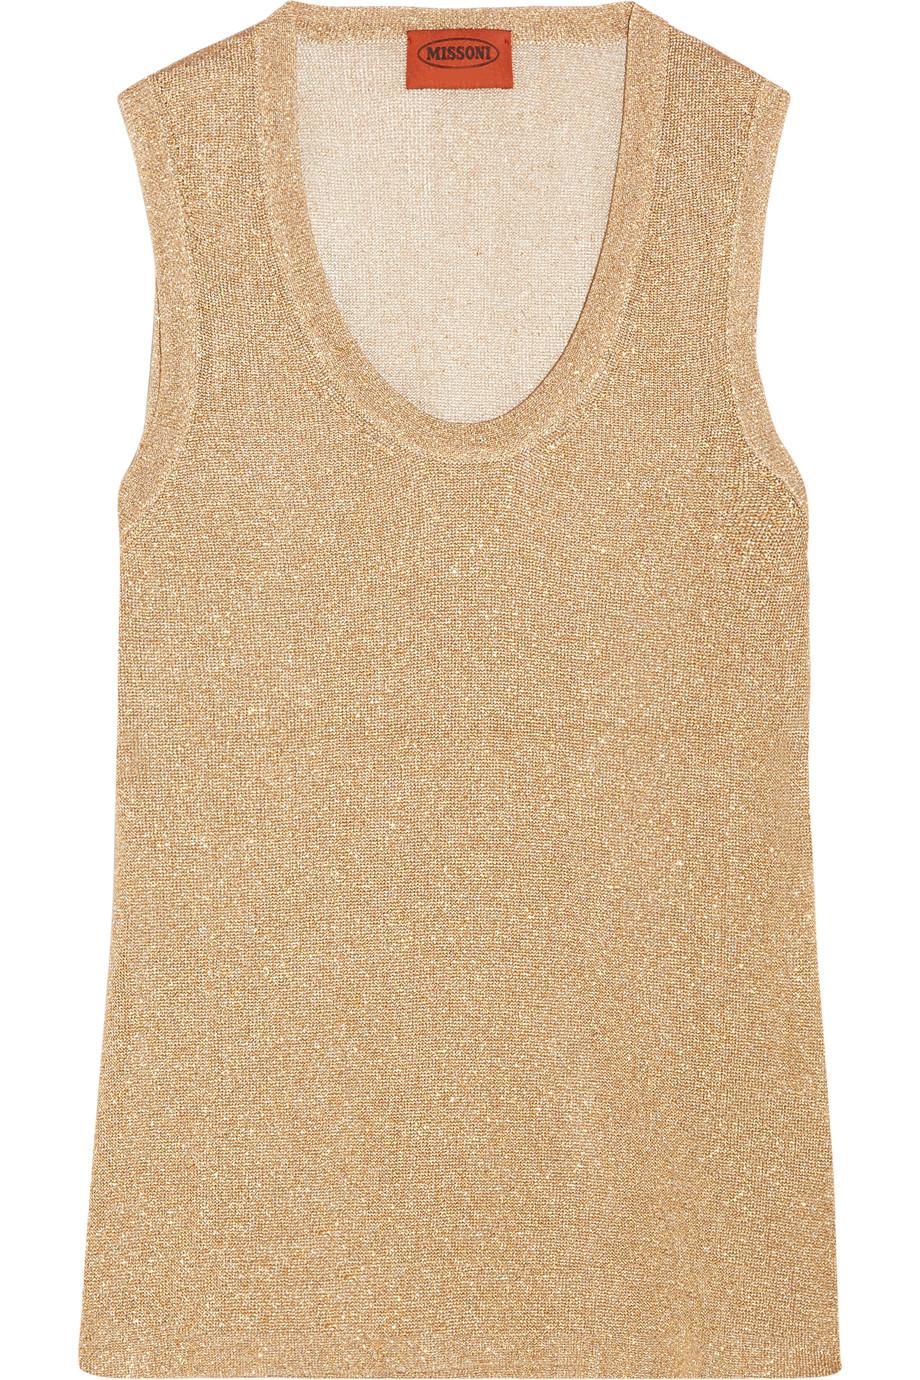 Missoni Metallic Crochet-Knit Top, Gold, Women's, Size: 42